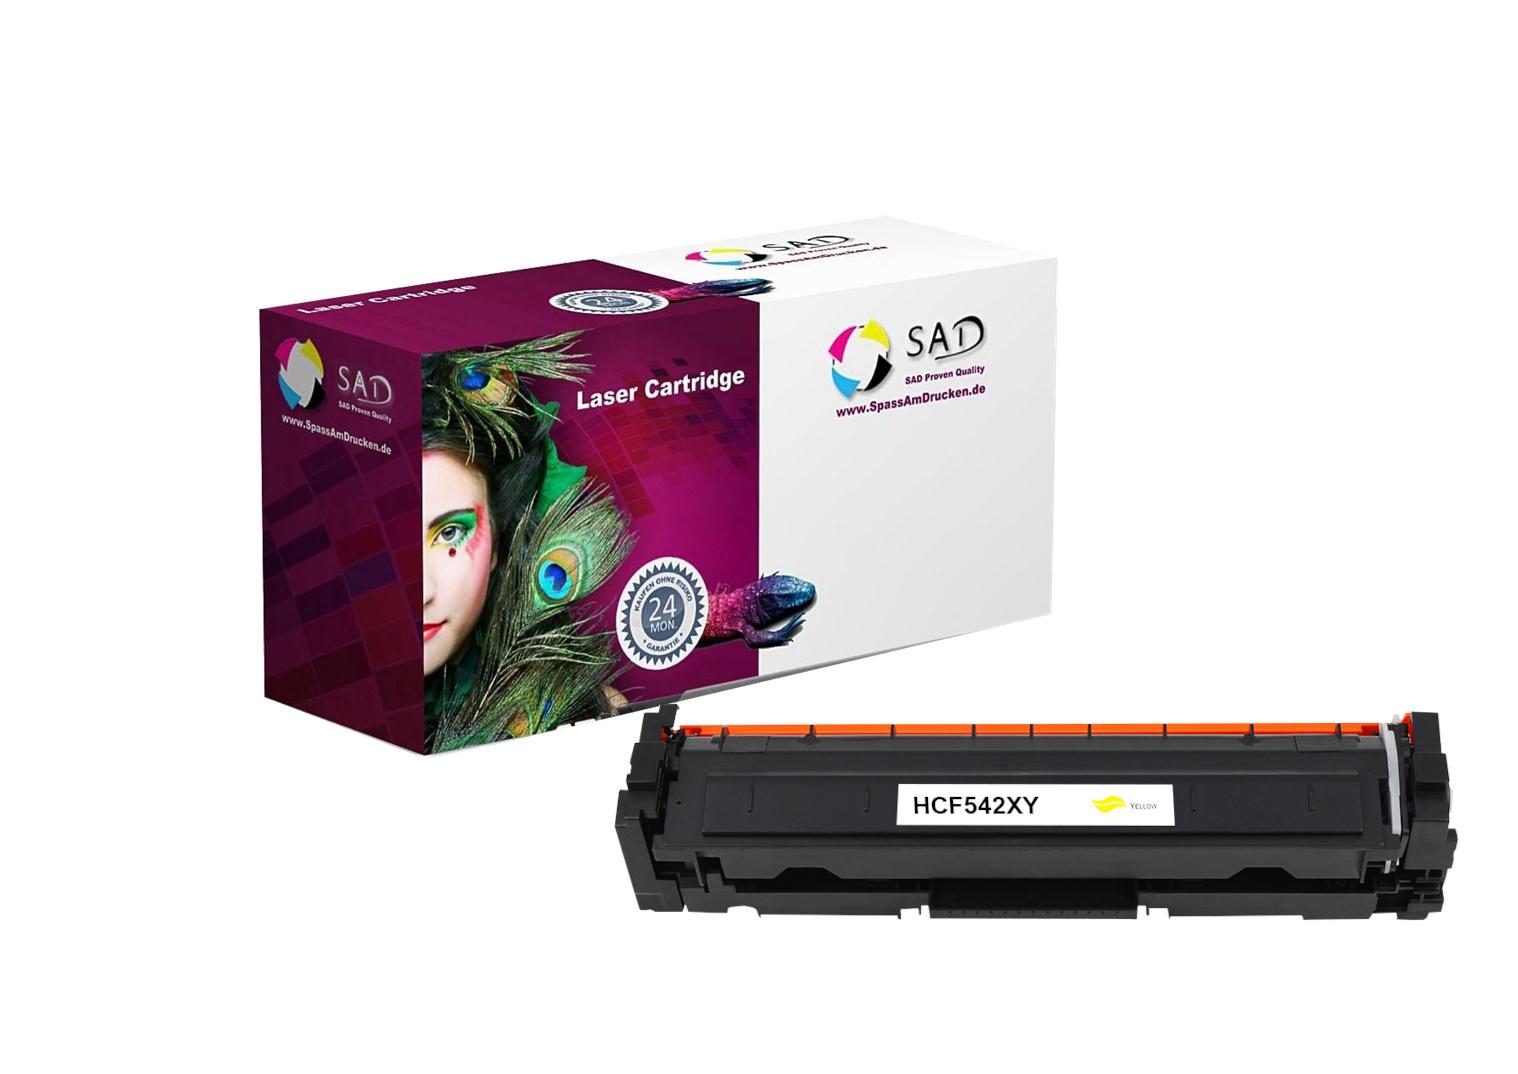 SAD Premium Toner komp. zu HP 203X - CF542X yellow für HP LaserJet Pro M254, HP LaserJet Pro M280, H